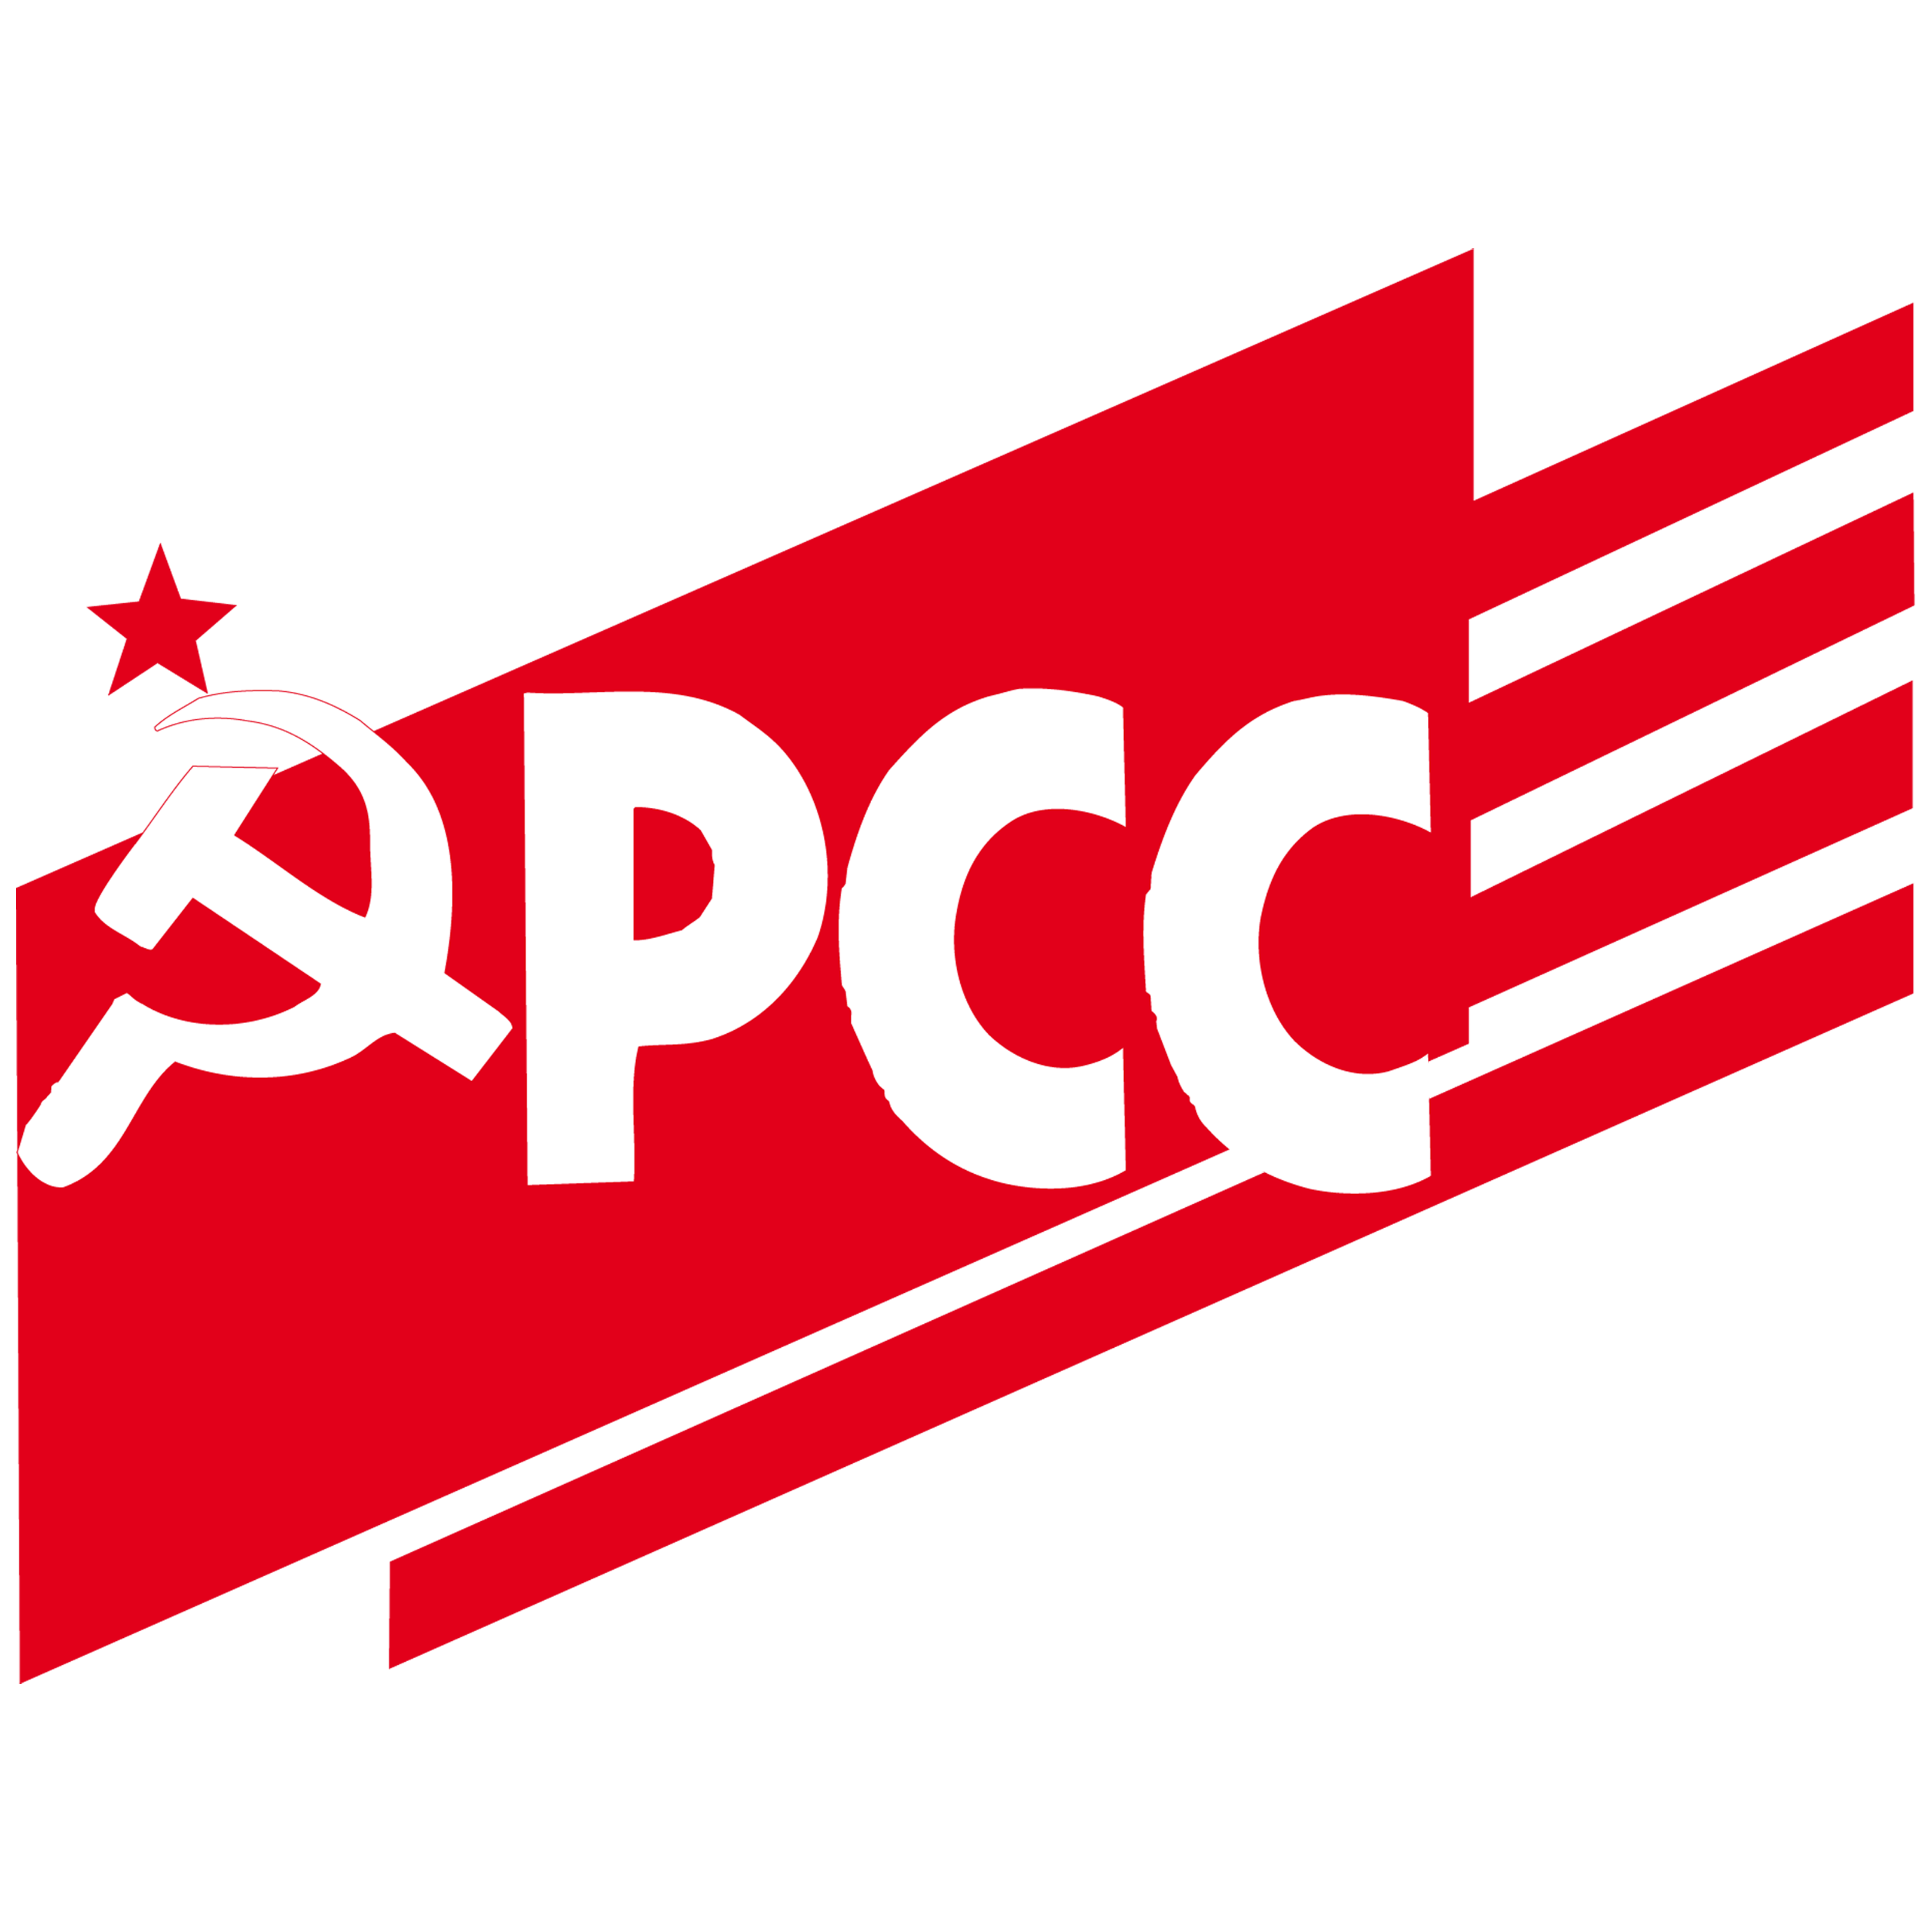 [Fic] La guerre civile CSPienne  - Page 2 Logo_del_PCC